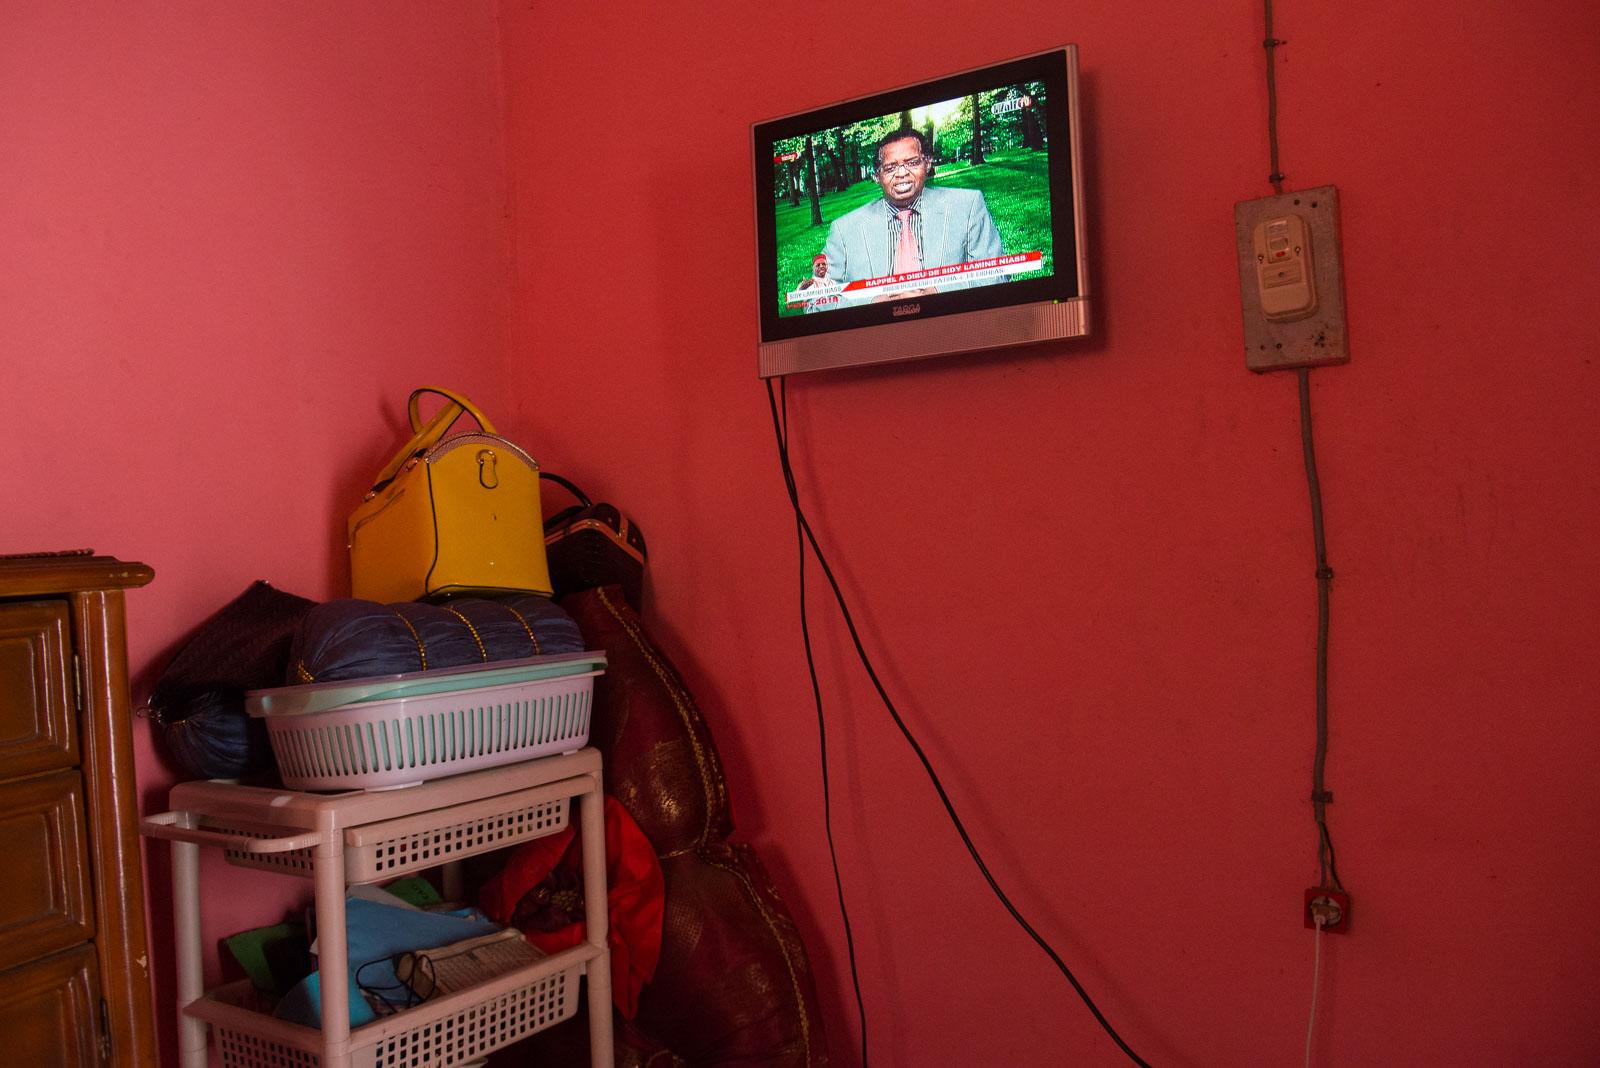 A news broadcast plays on a TV in Khadija's bedroom